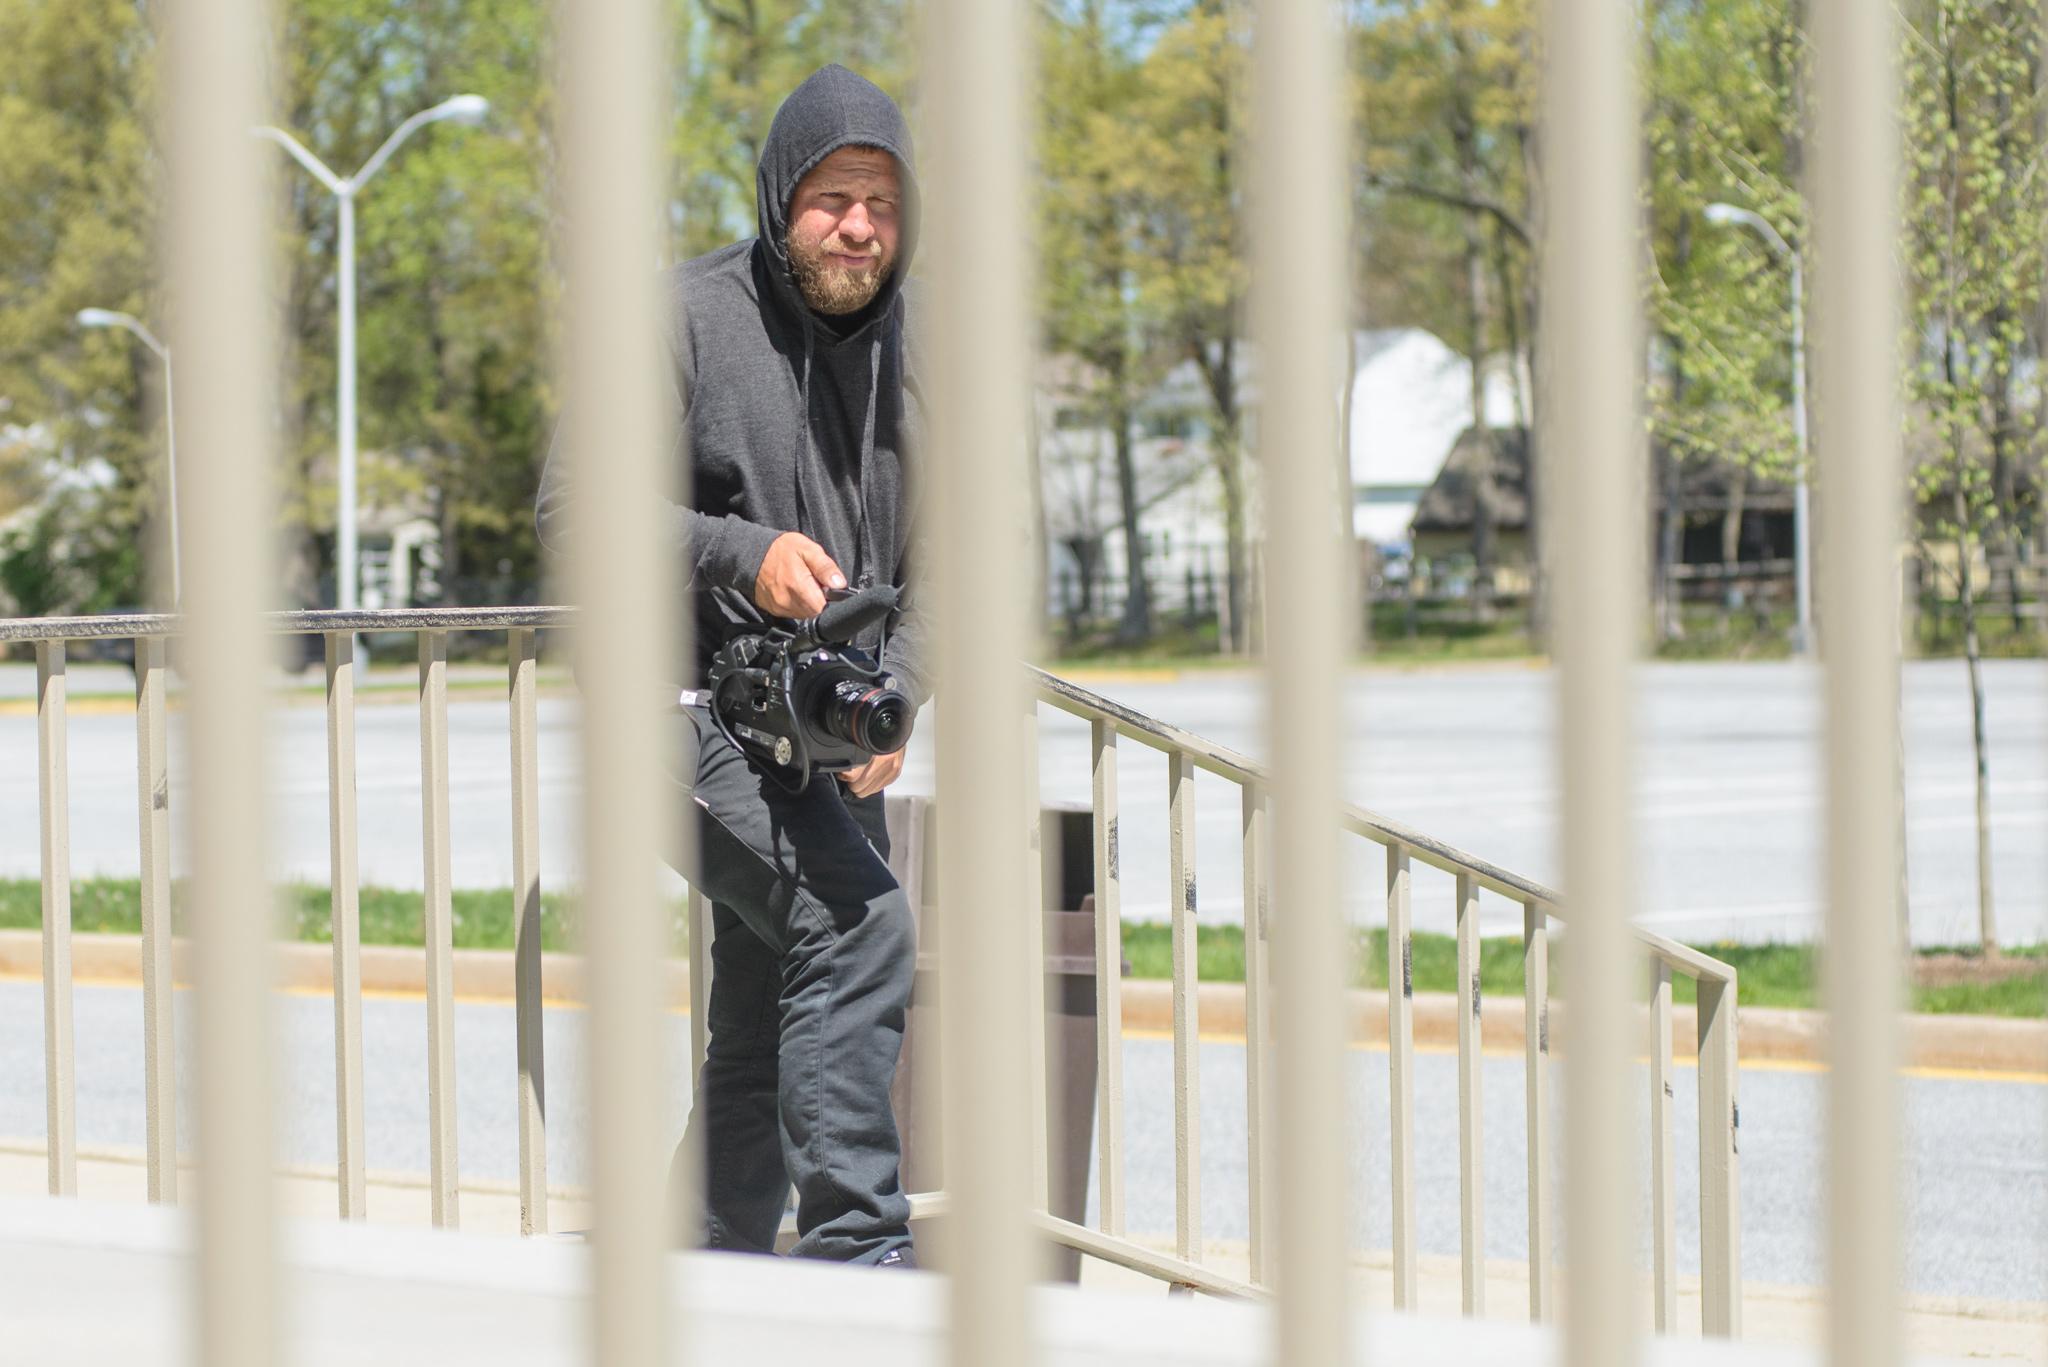 Homan's filmer: Ryan Navazio